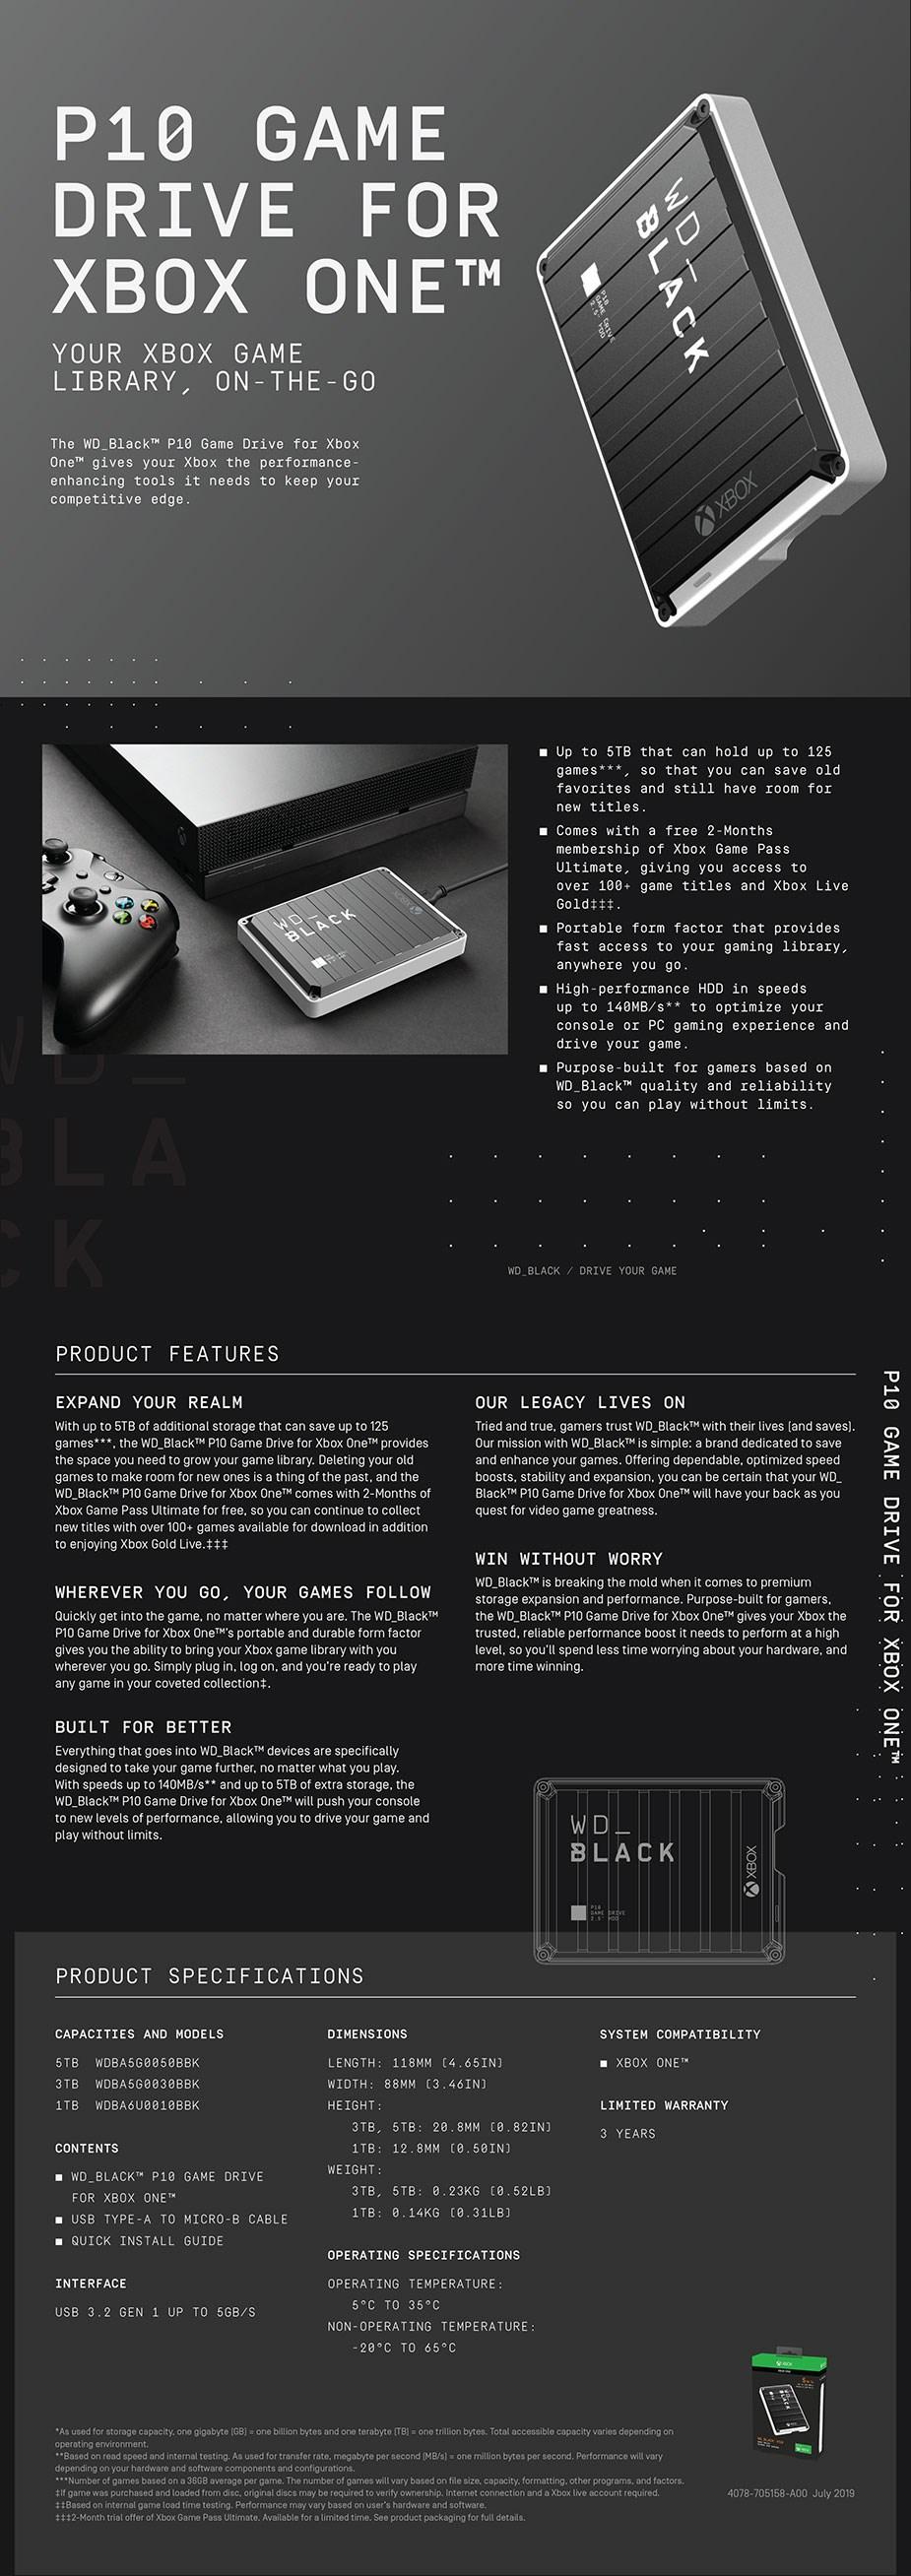 wd-black-3tb-p10-game-drive-fafor-xbox-one-wdba5g0030bbk-ac31472-6.jpg